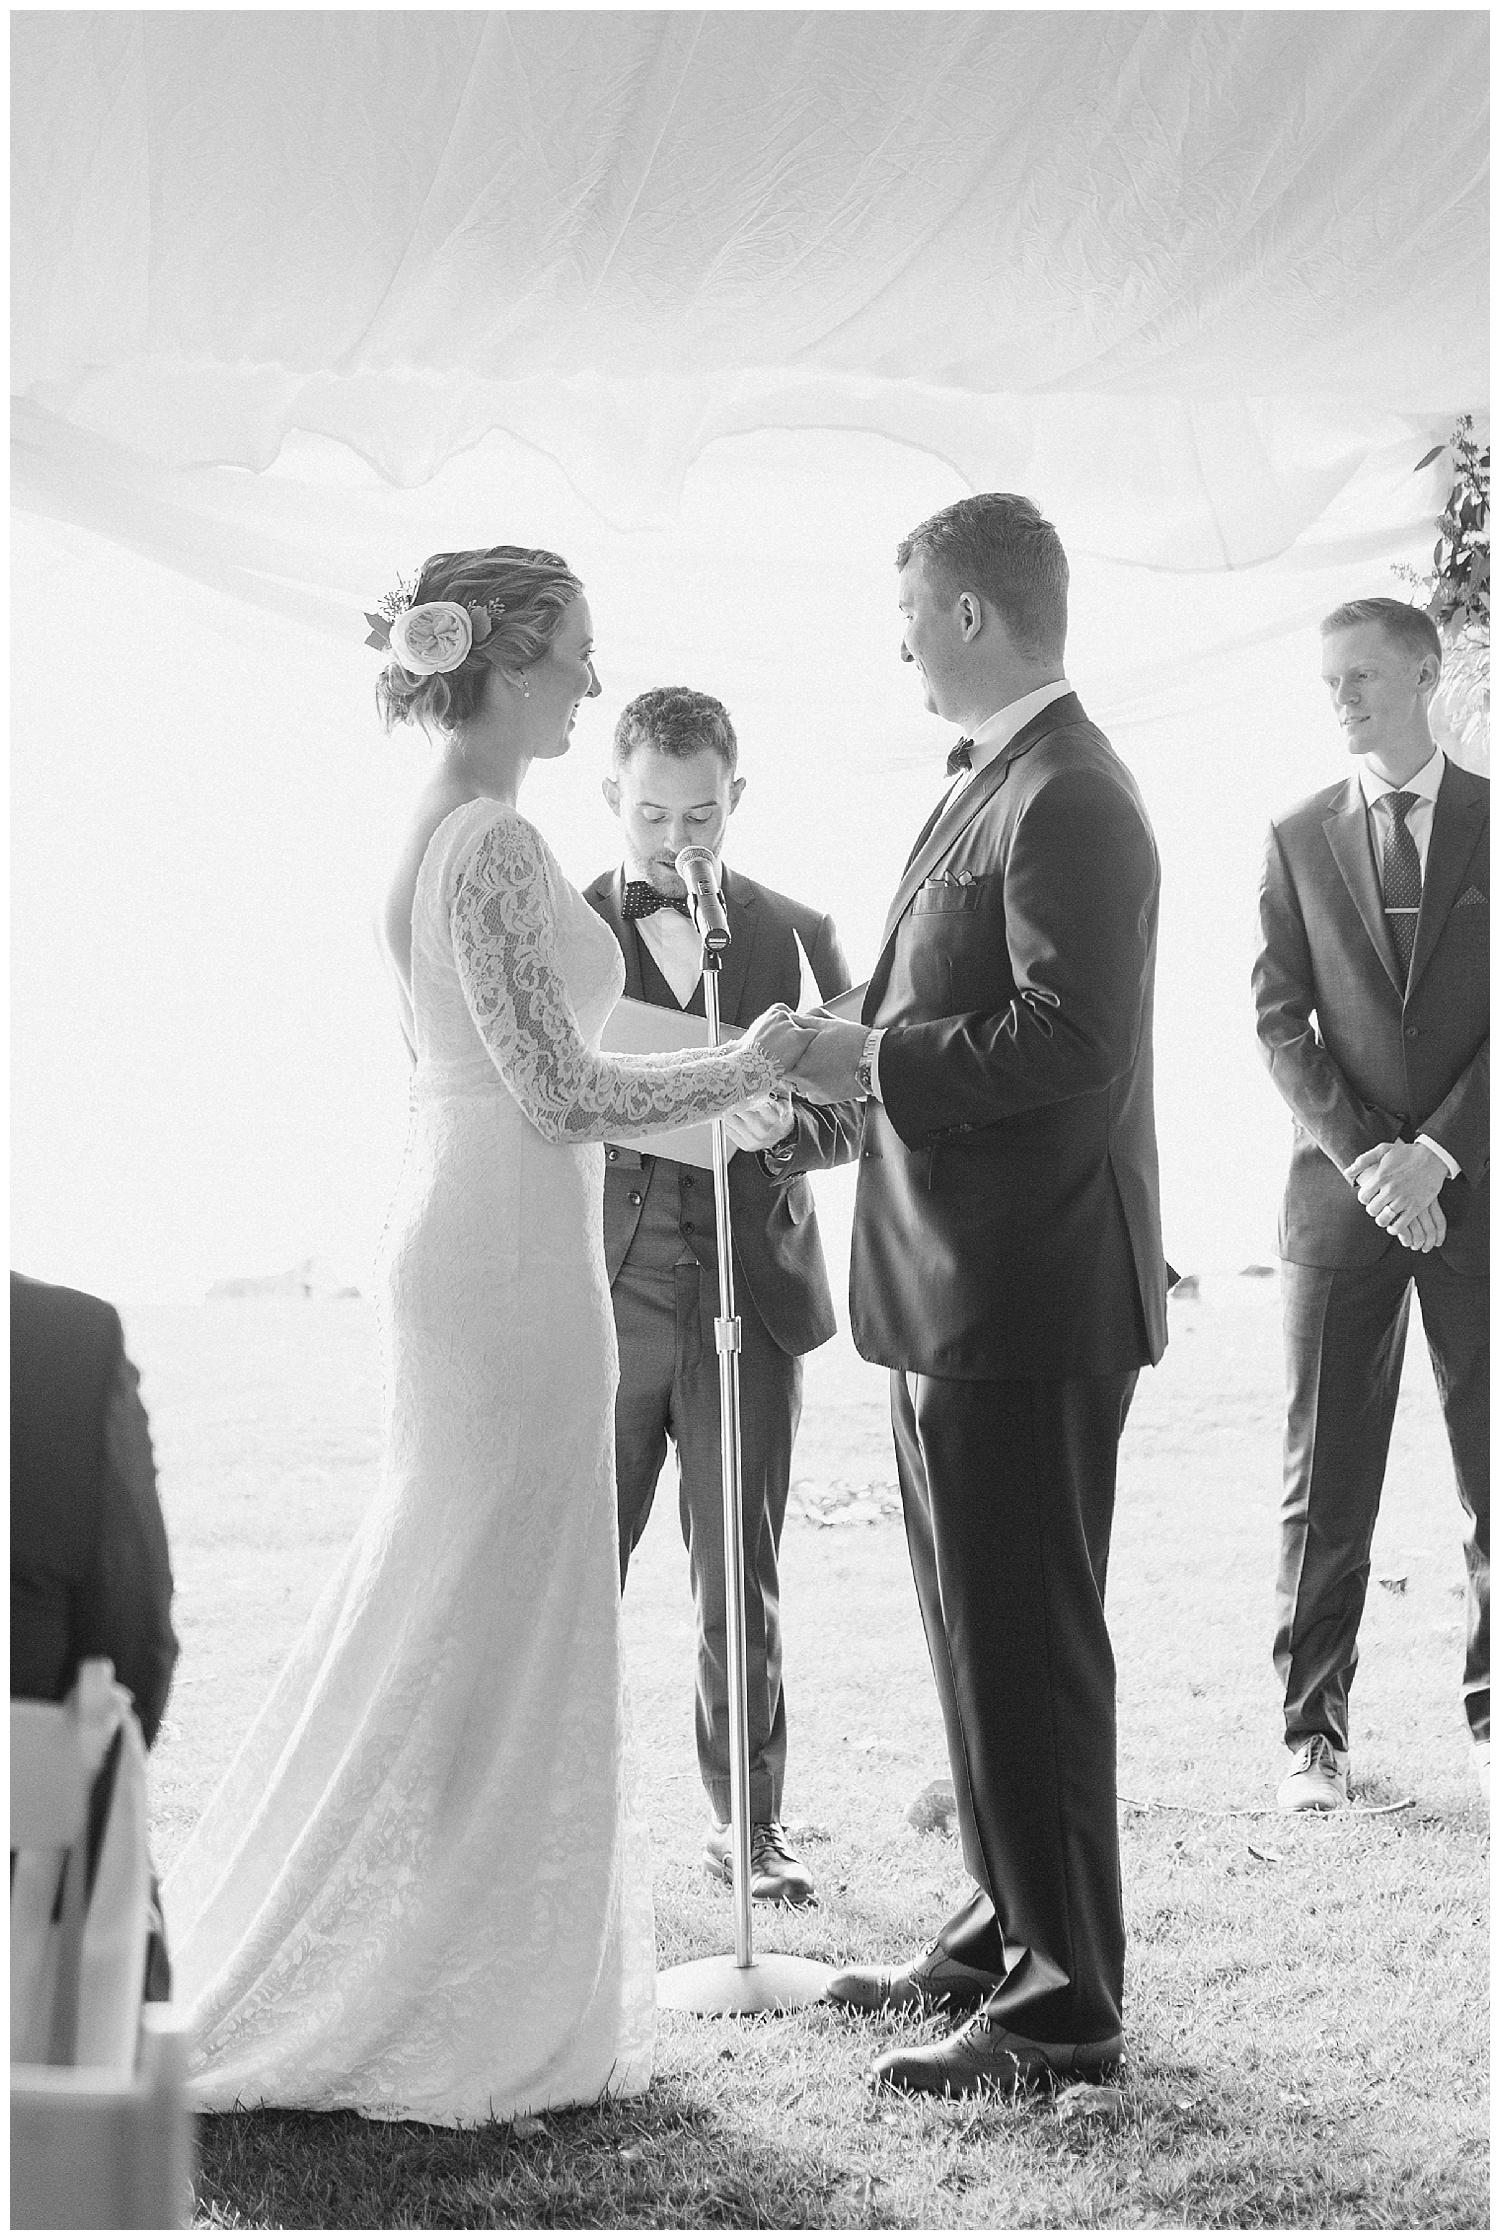 Margaret and Colin - Inns of Aurora - Lass and Beau-1073_Buffalo wedding photography.jpg